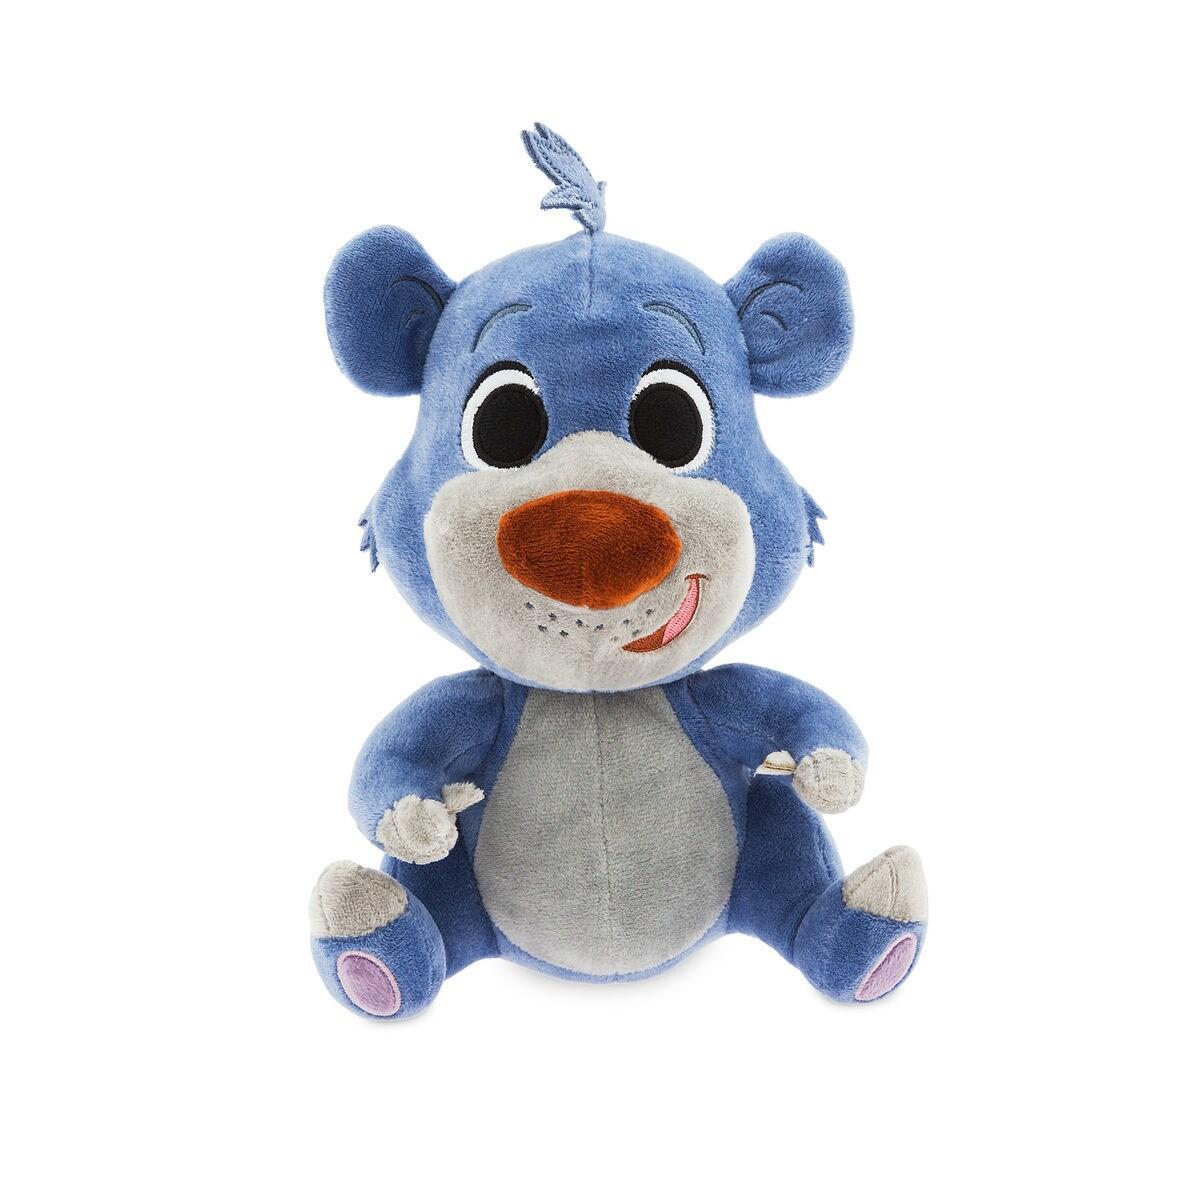 Baloo Plush The Jungle Book Disney Furrytale Friends Small